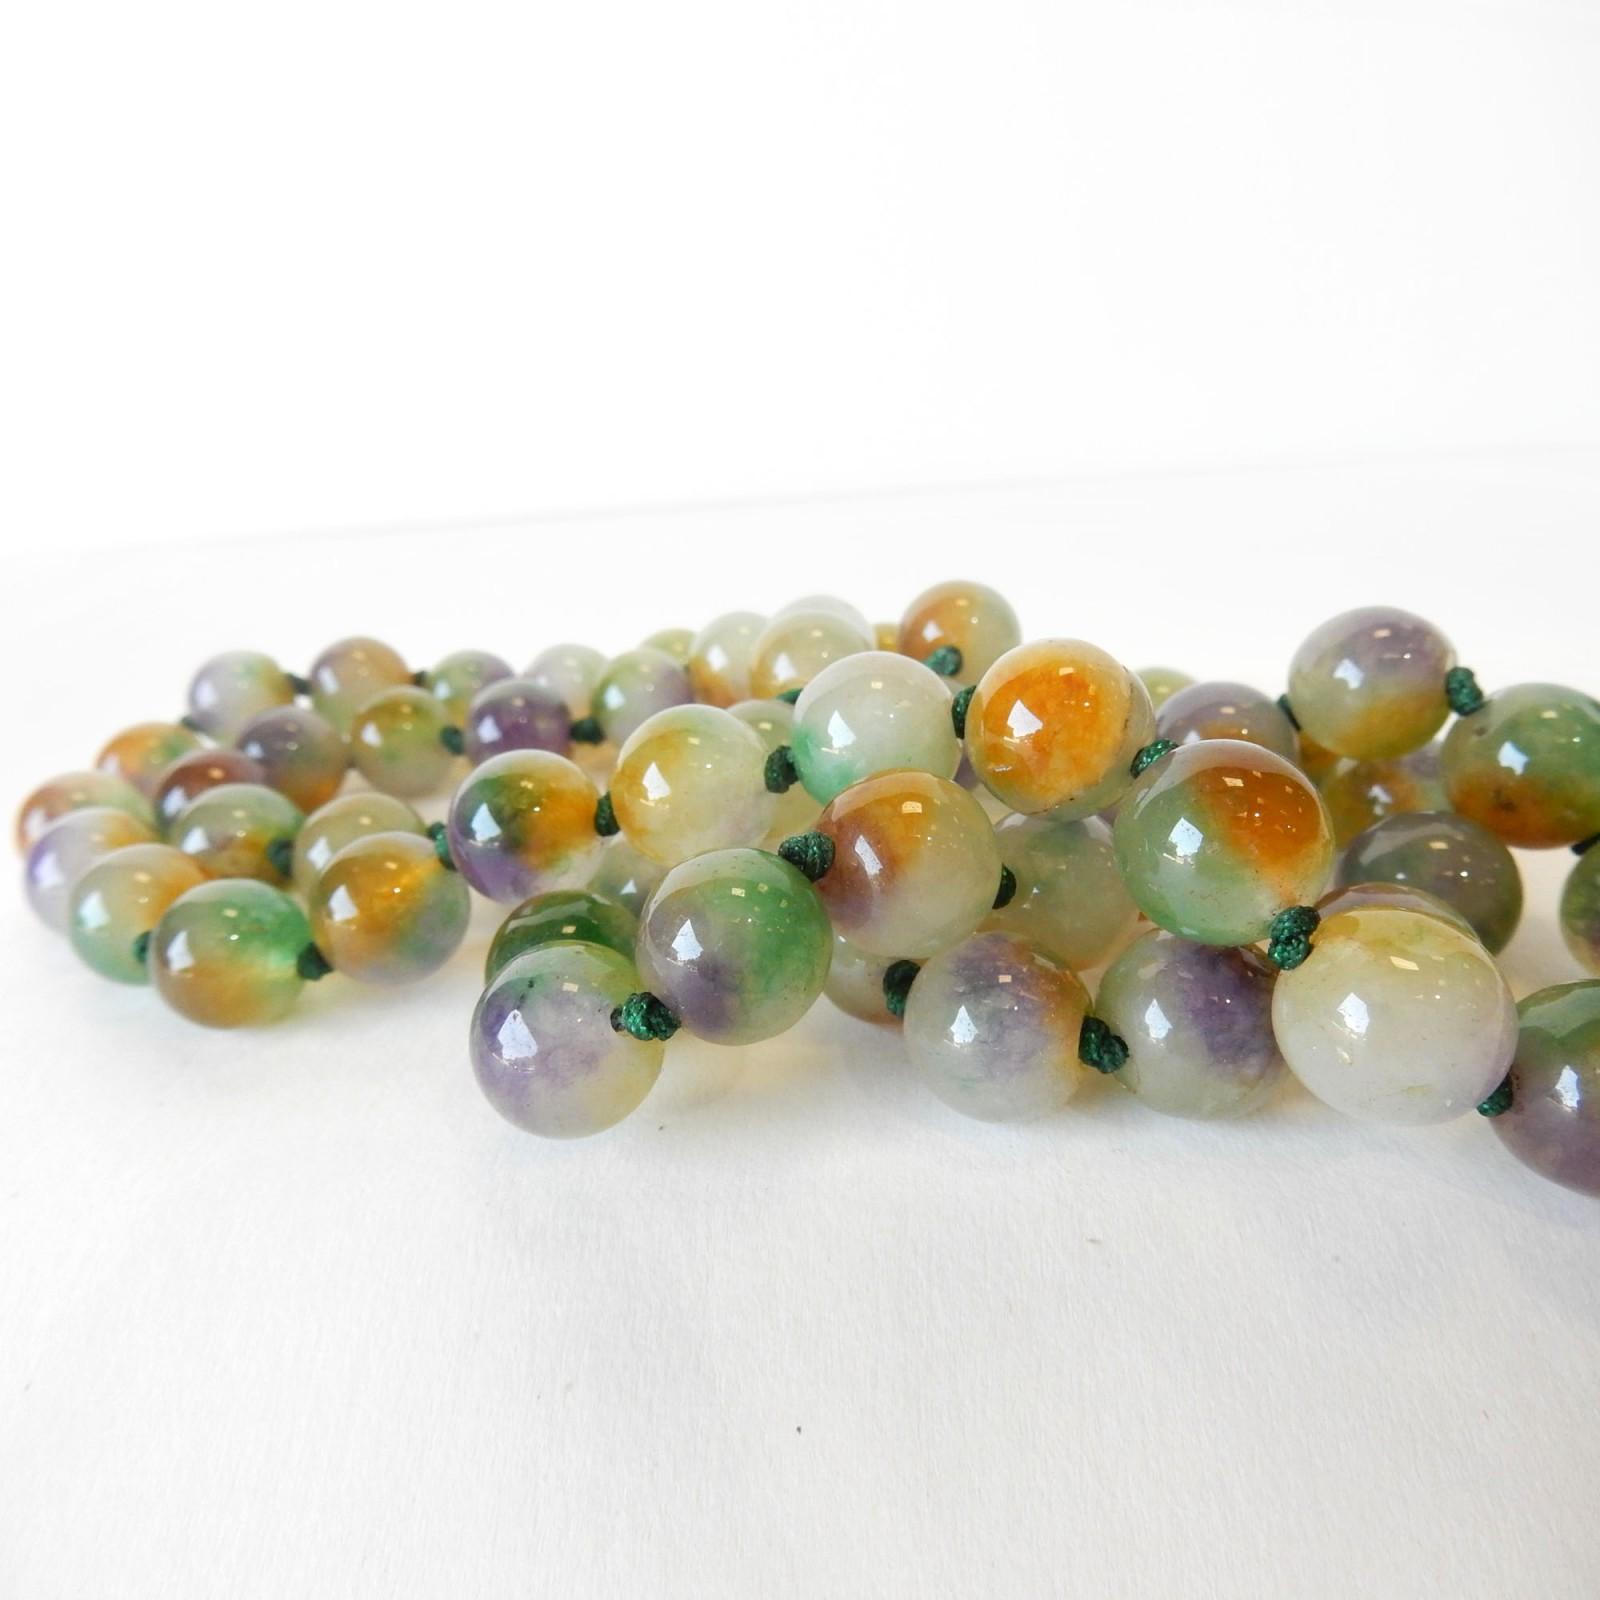 Photo of Natural Quartz String Bead Gemstone Necklace